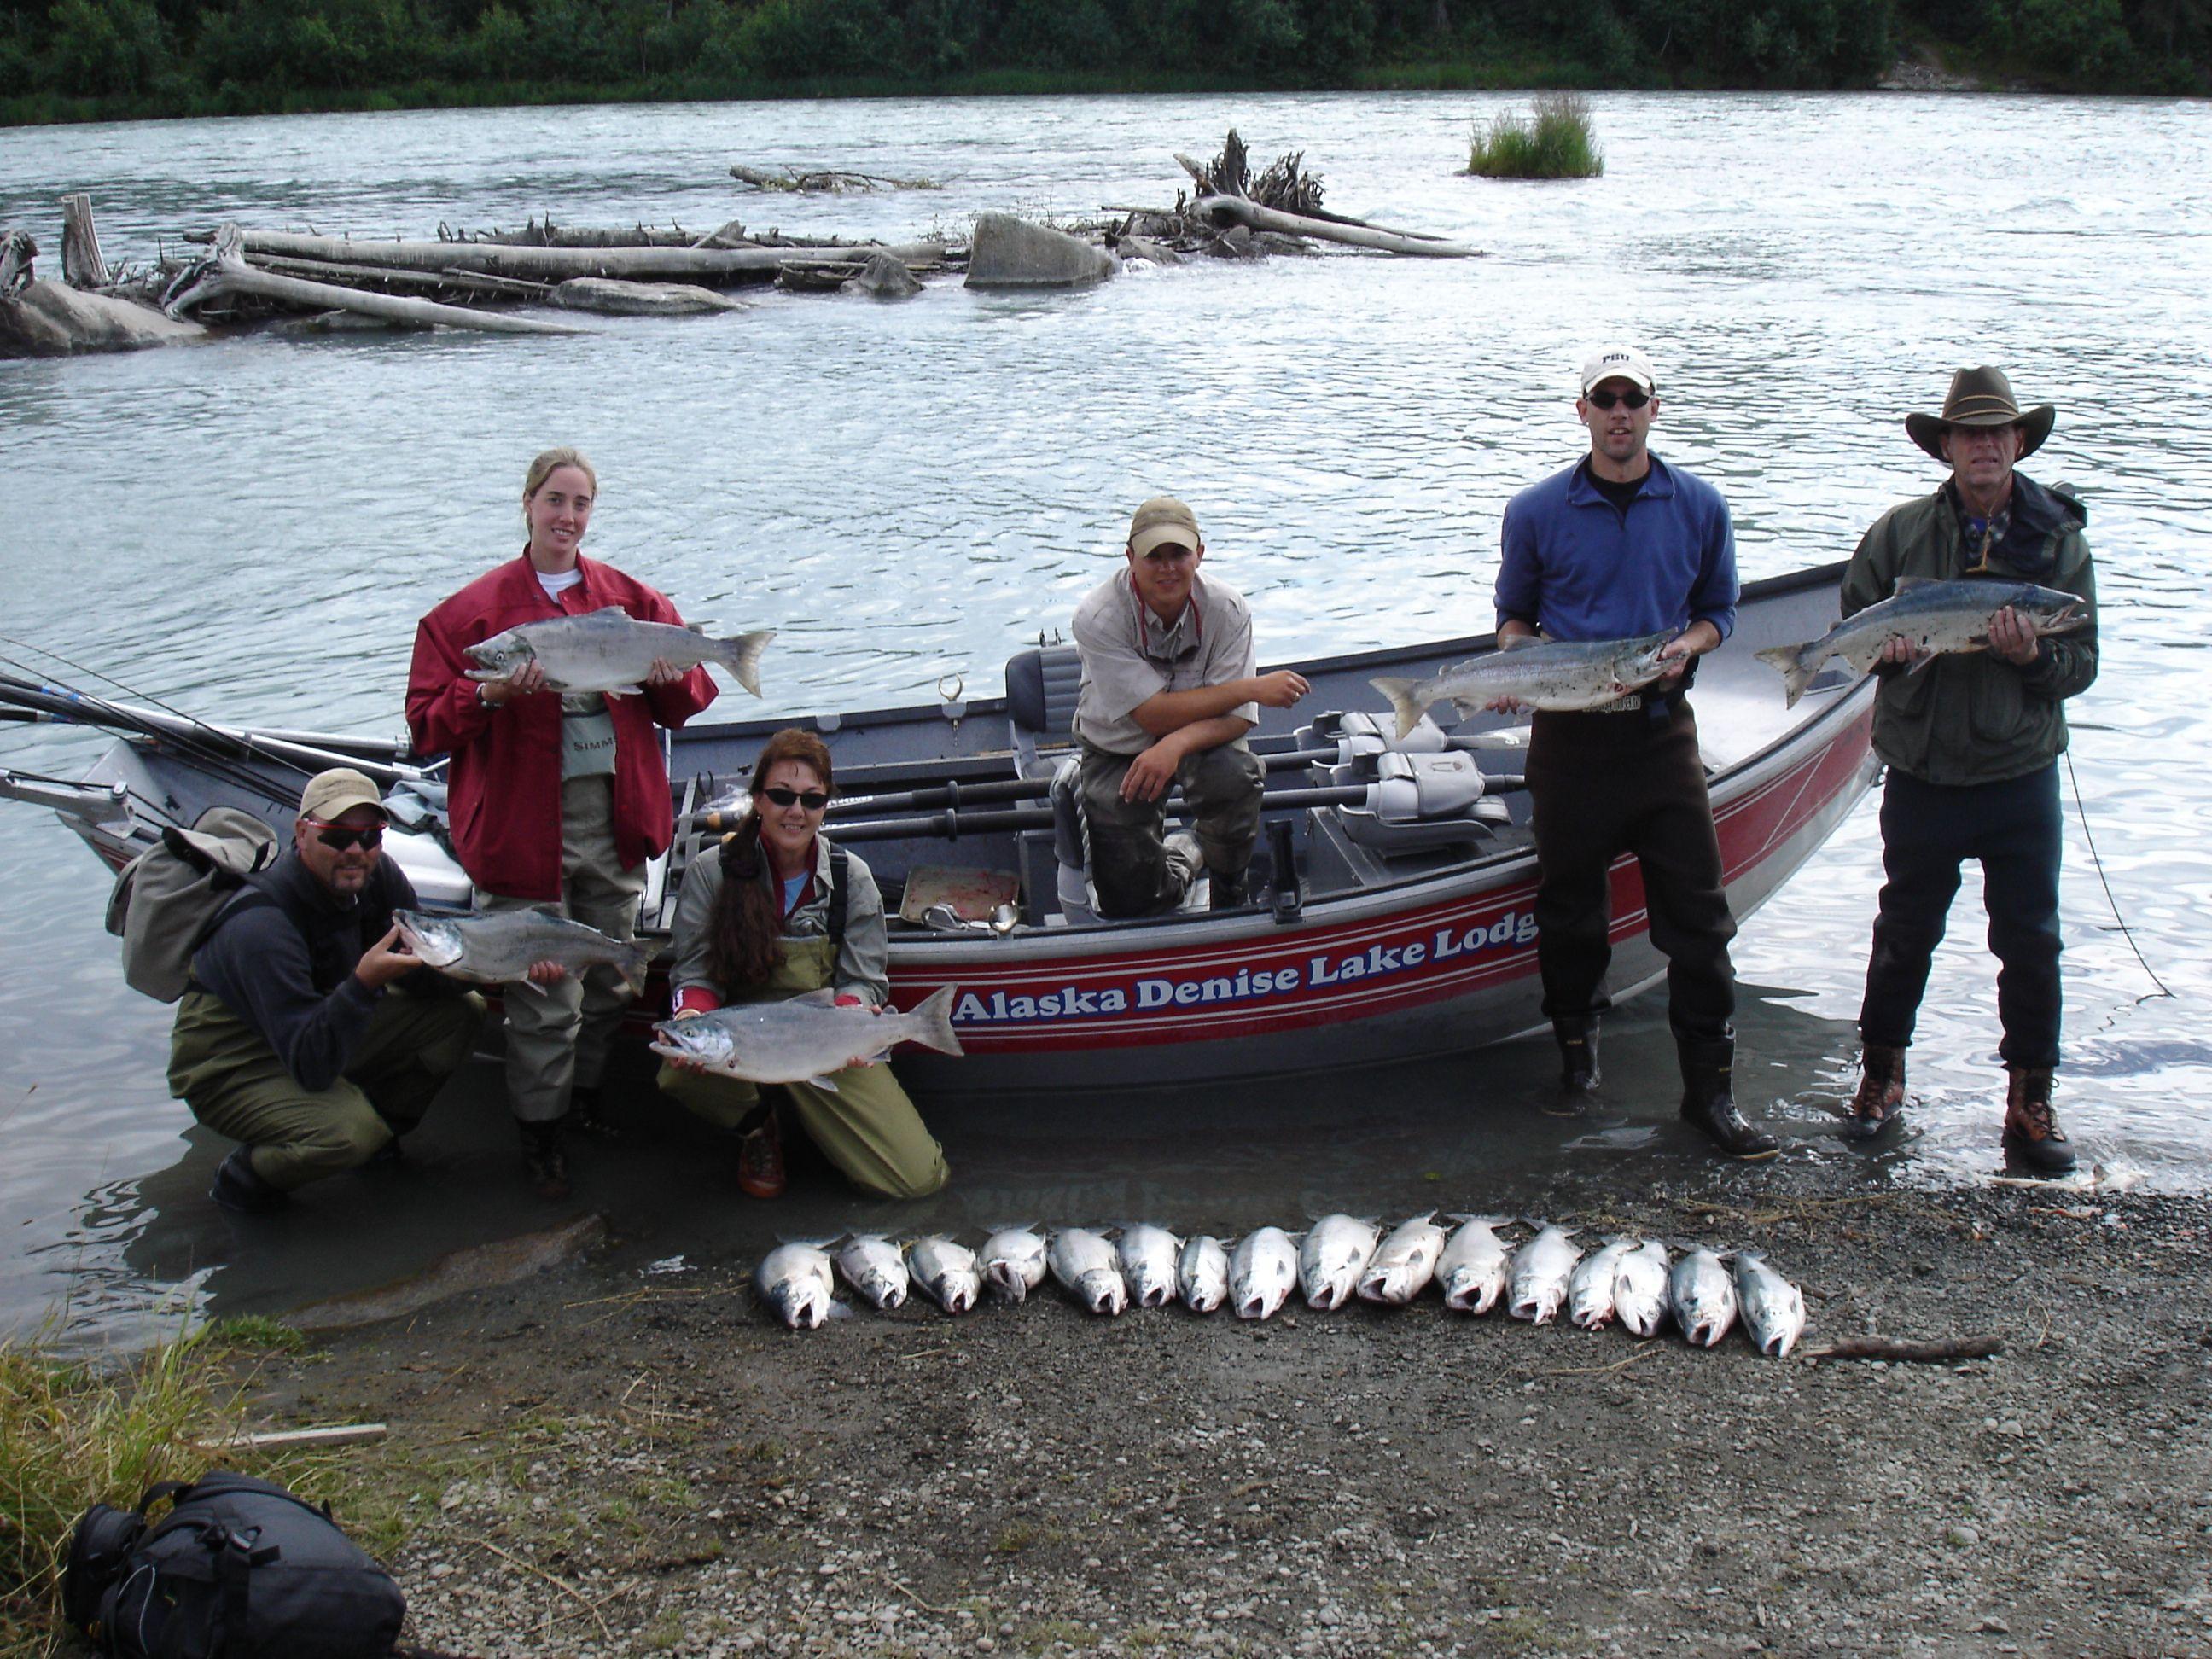 New All Inclusive Fishing Vacation Packages E E Alaska Salmon - All inclusive alaska